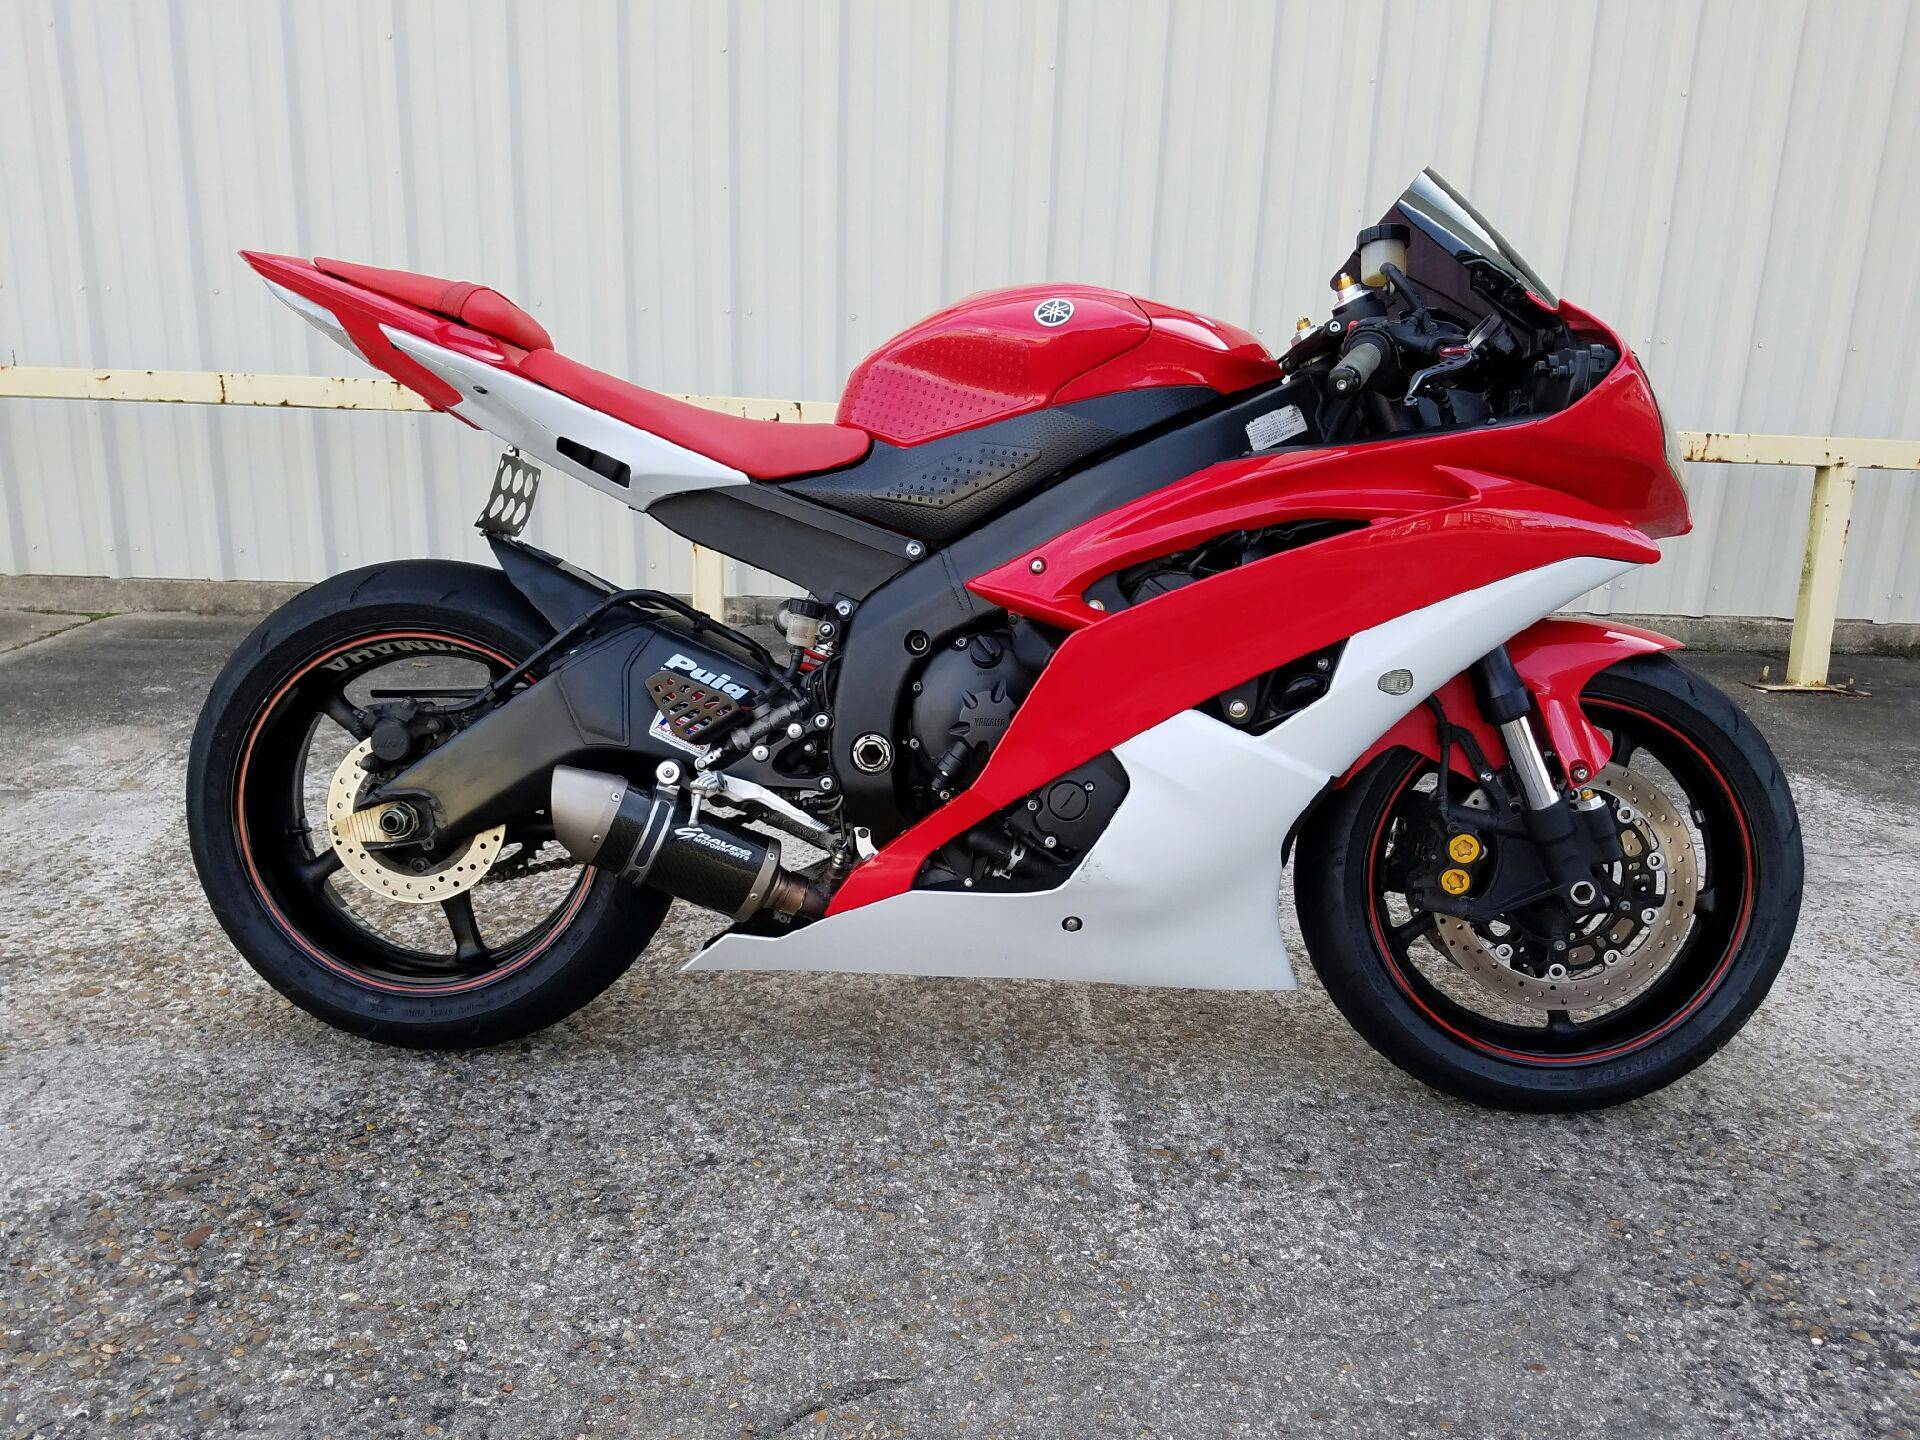 2013 Yamaha YZF-R6 in Pasadena, Texas